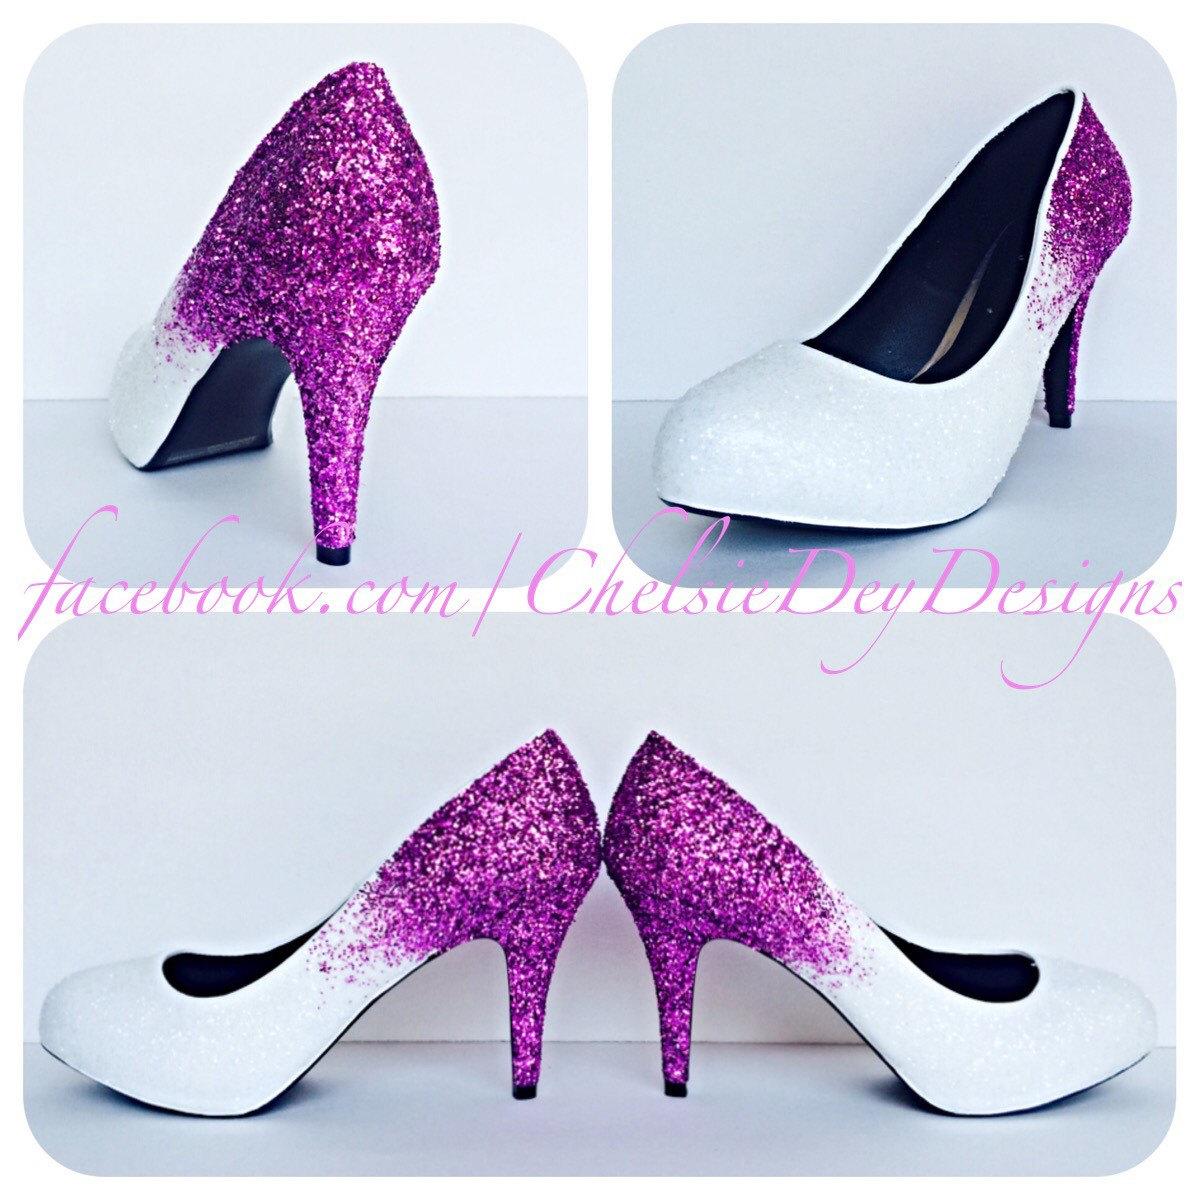 Fuschia Low Heel Wedding Shoes: Hot Pink Glitter High Heels, Fuschia Magenta Platform